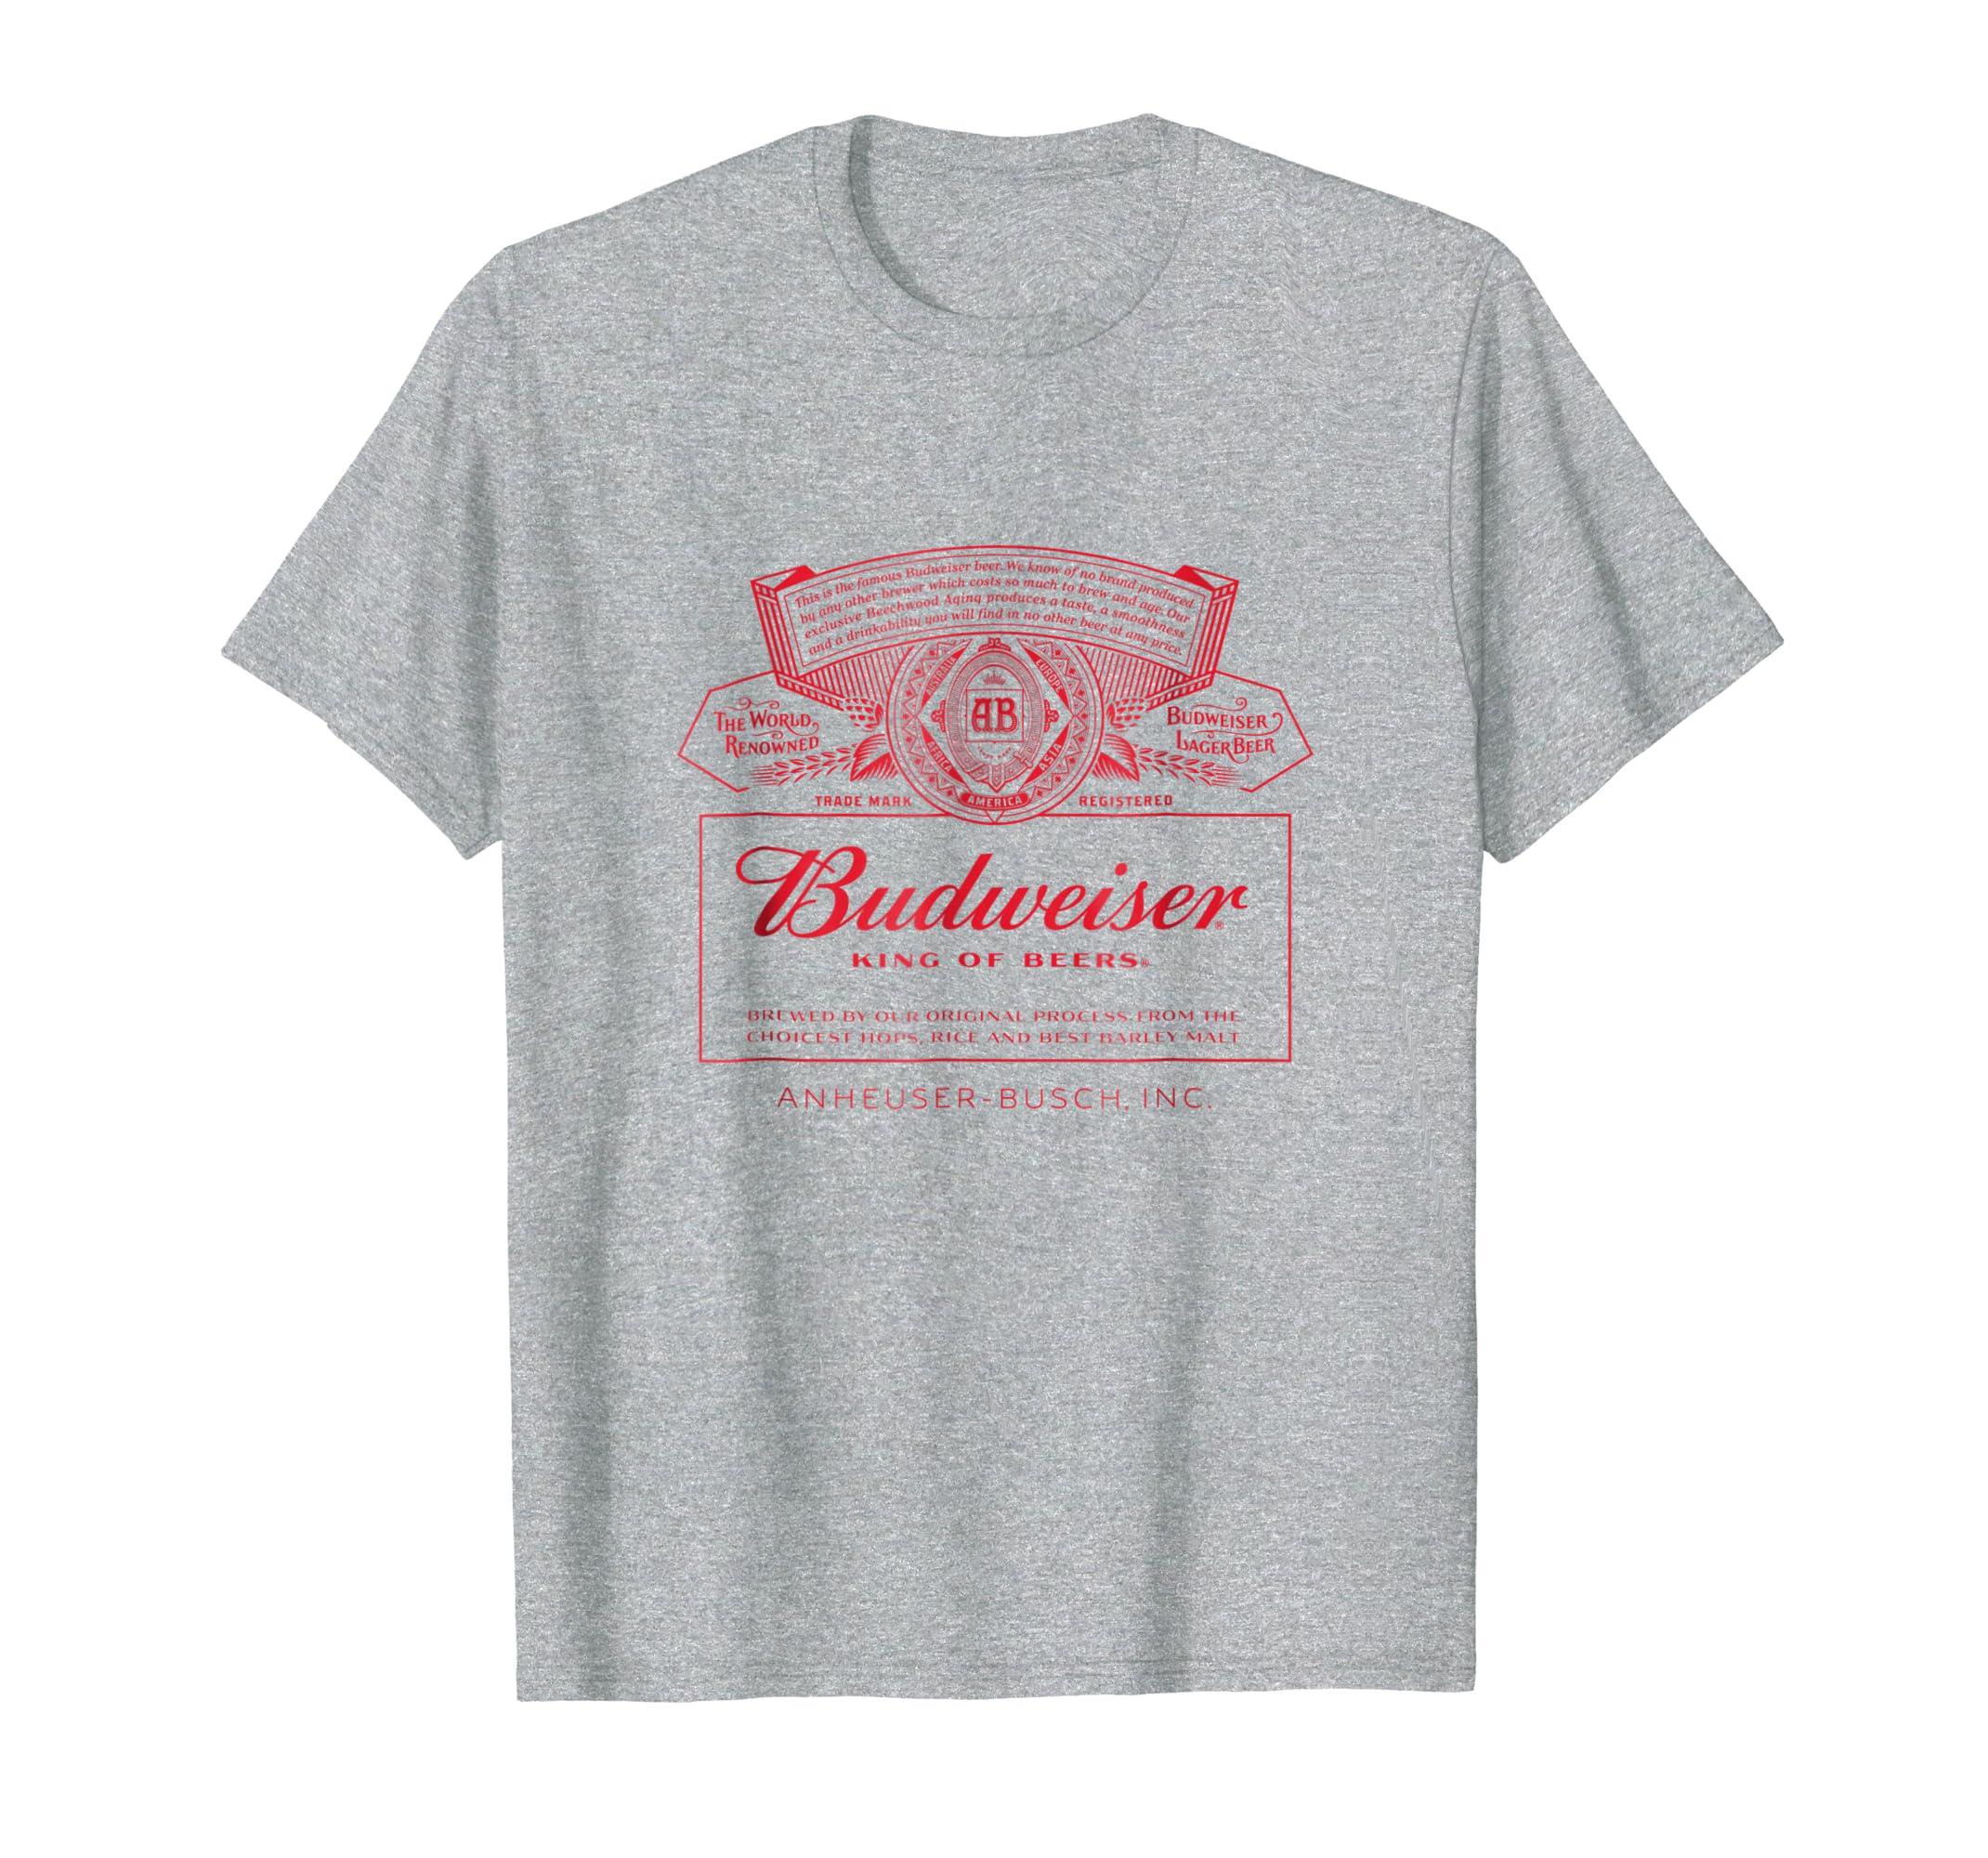 44651fc7 Amazon.com: Budweiser Can Label T-Shirt: Clothing